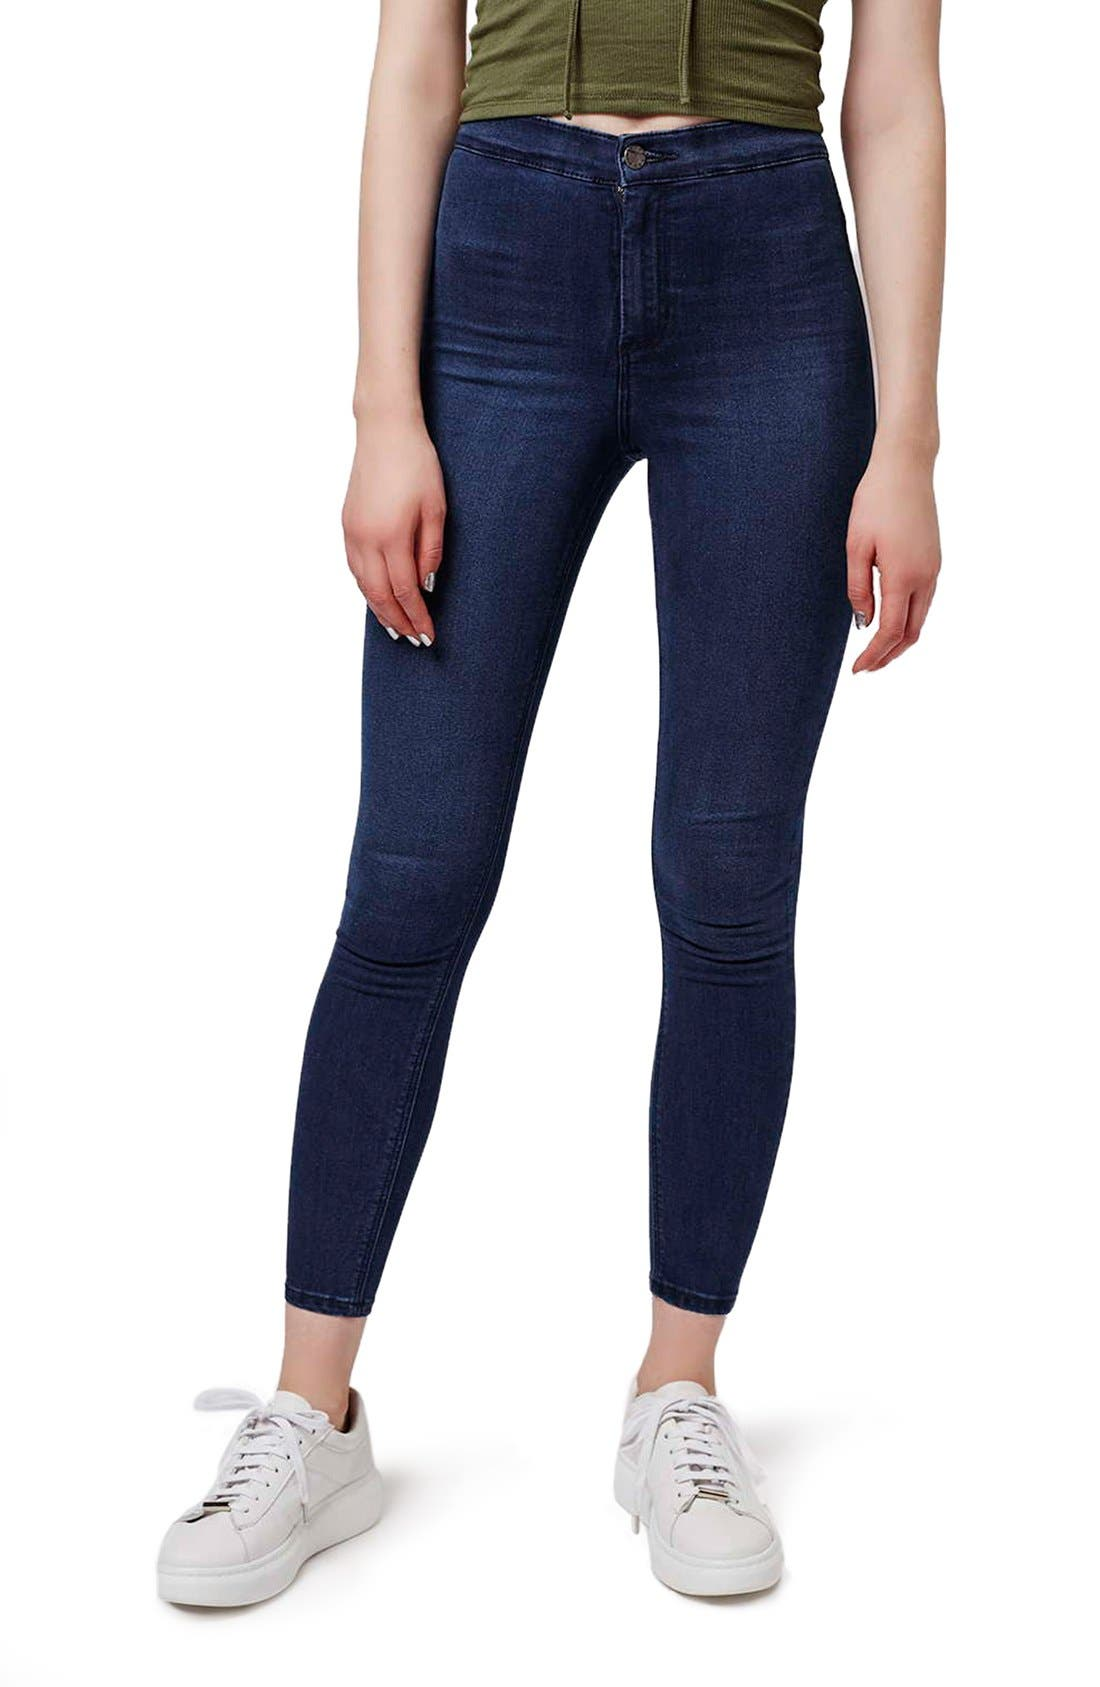 Alternate Image 1 Selected - Topshop 'Joni' Crop Super Skinny Jeans (Petite)